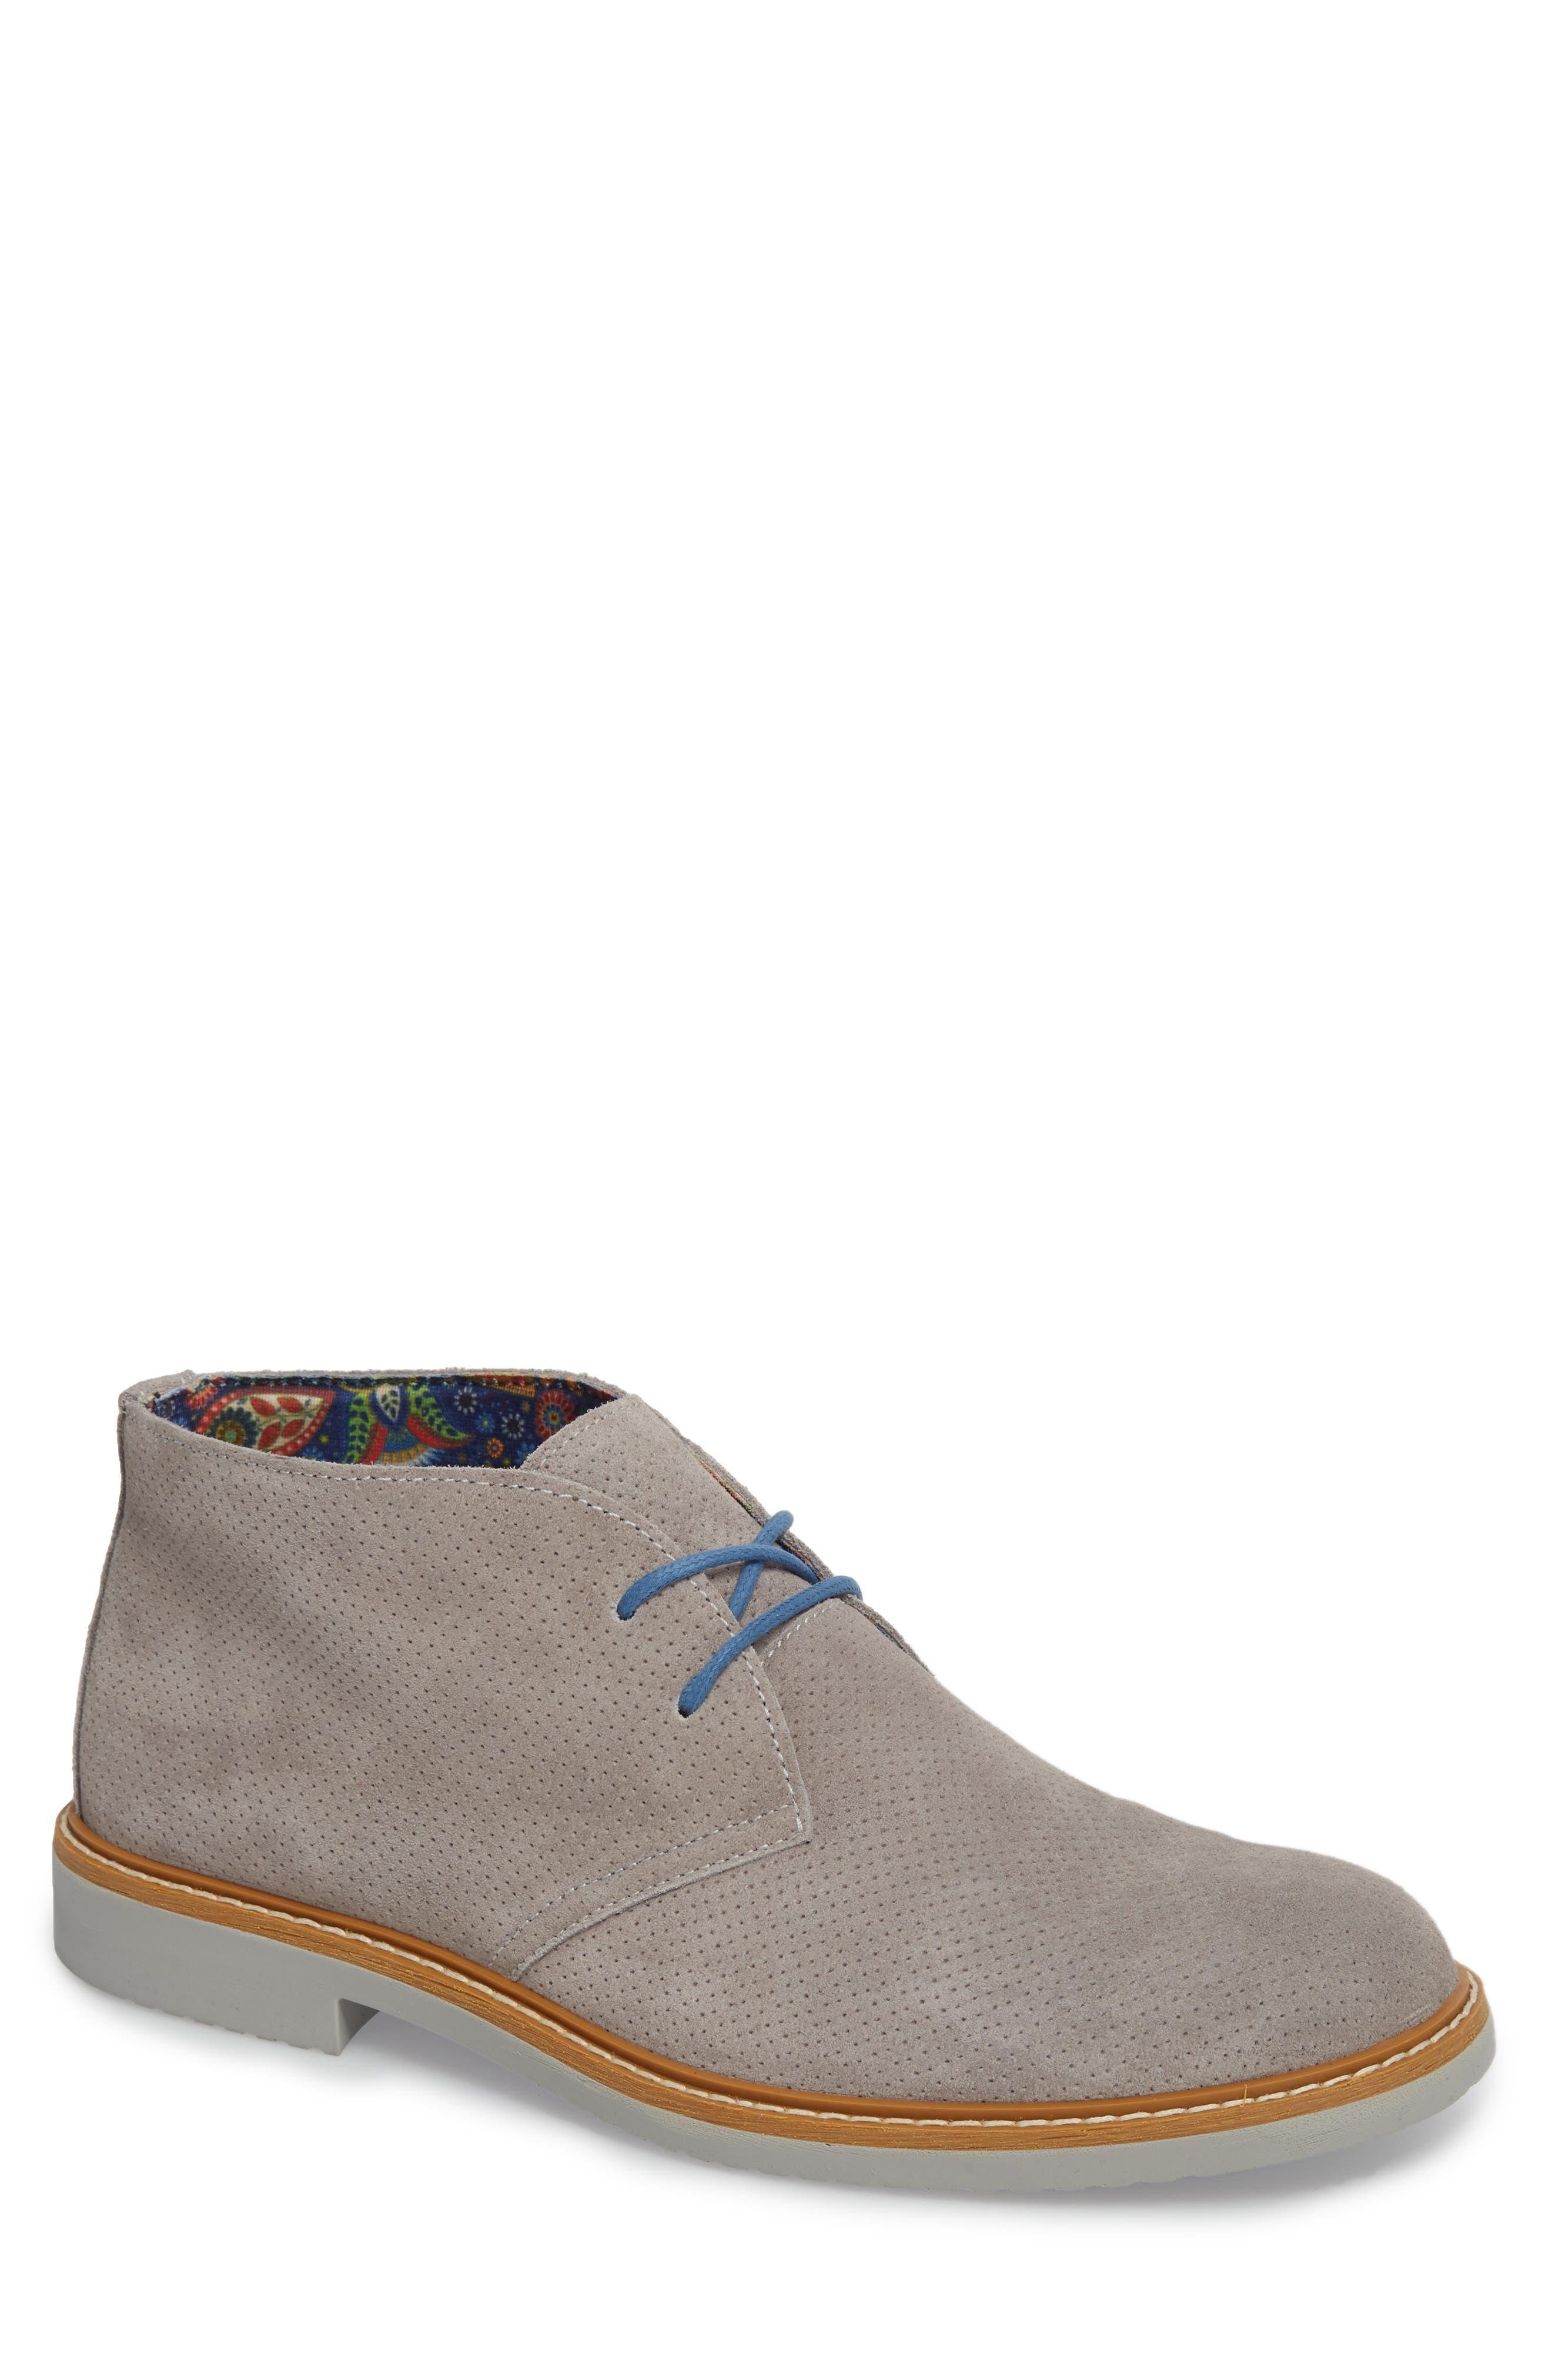 Bayside Perforated Chukka Boot,                         Main,                         color, 020